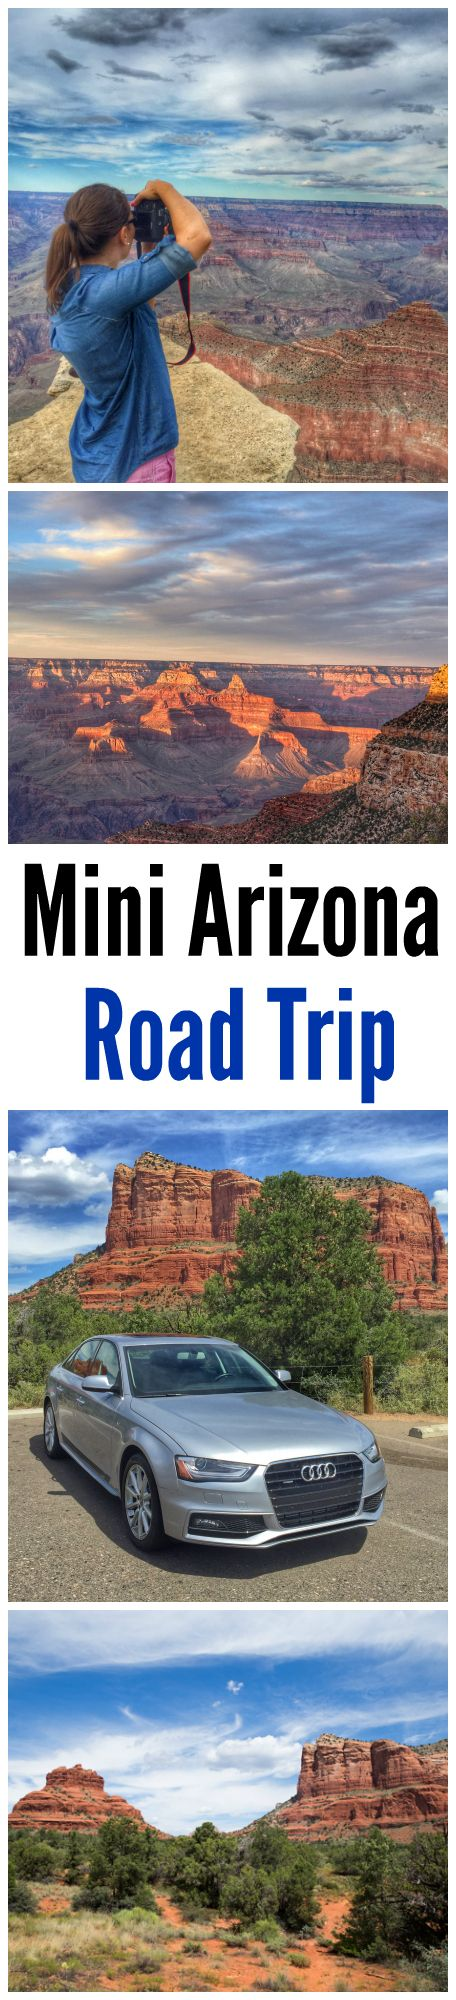 Mini Arizona Road Trip featuring a 5